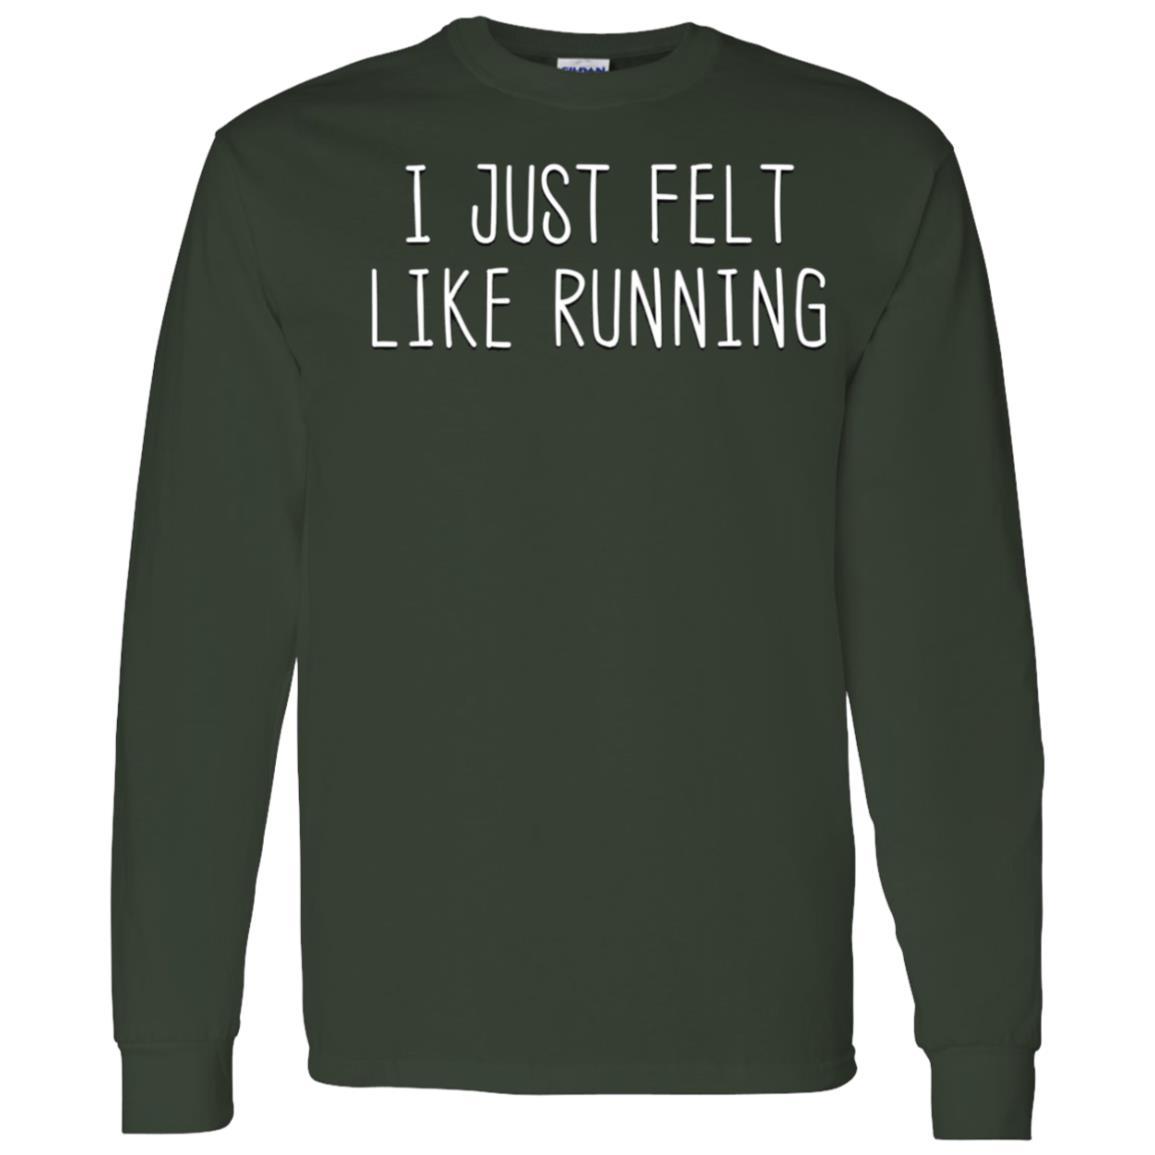 I Just Felt Like Running Workout Exercise Jogging Men Long Sleeve T-Shirt